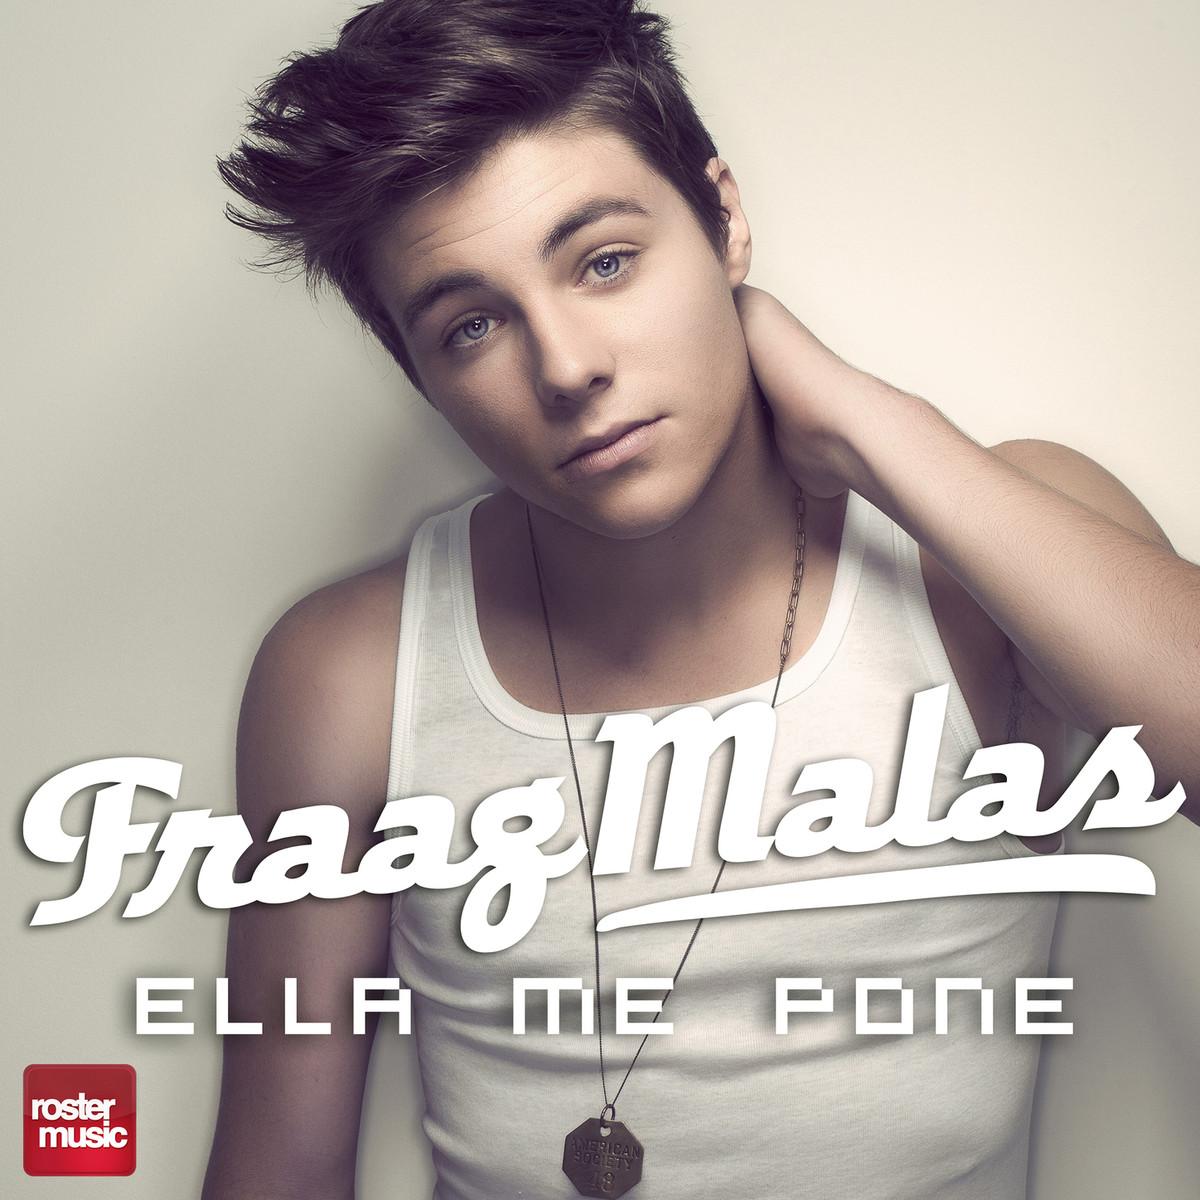 Fraag-Malas-Ella-Me-Pone-2013-1200x1200